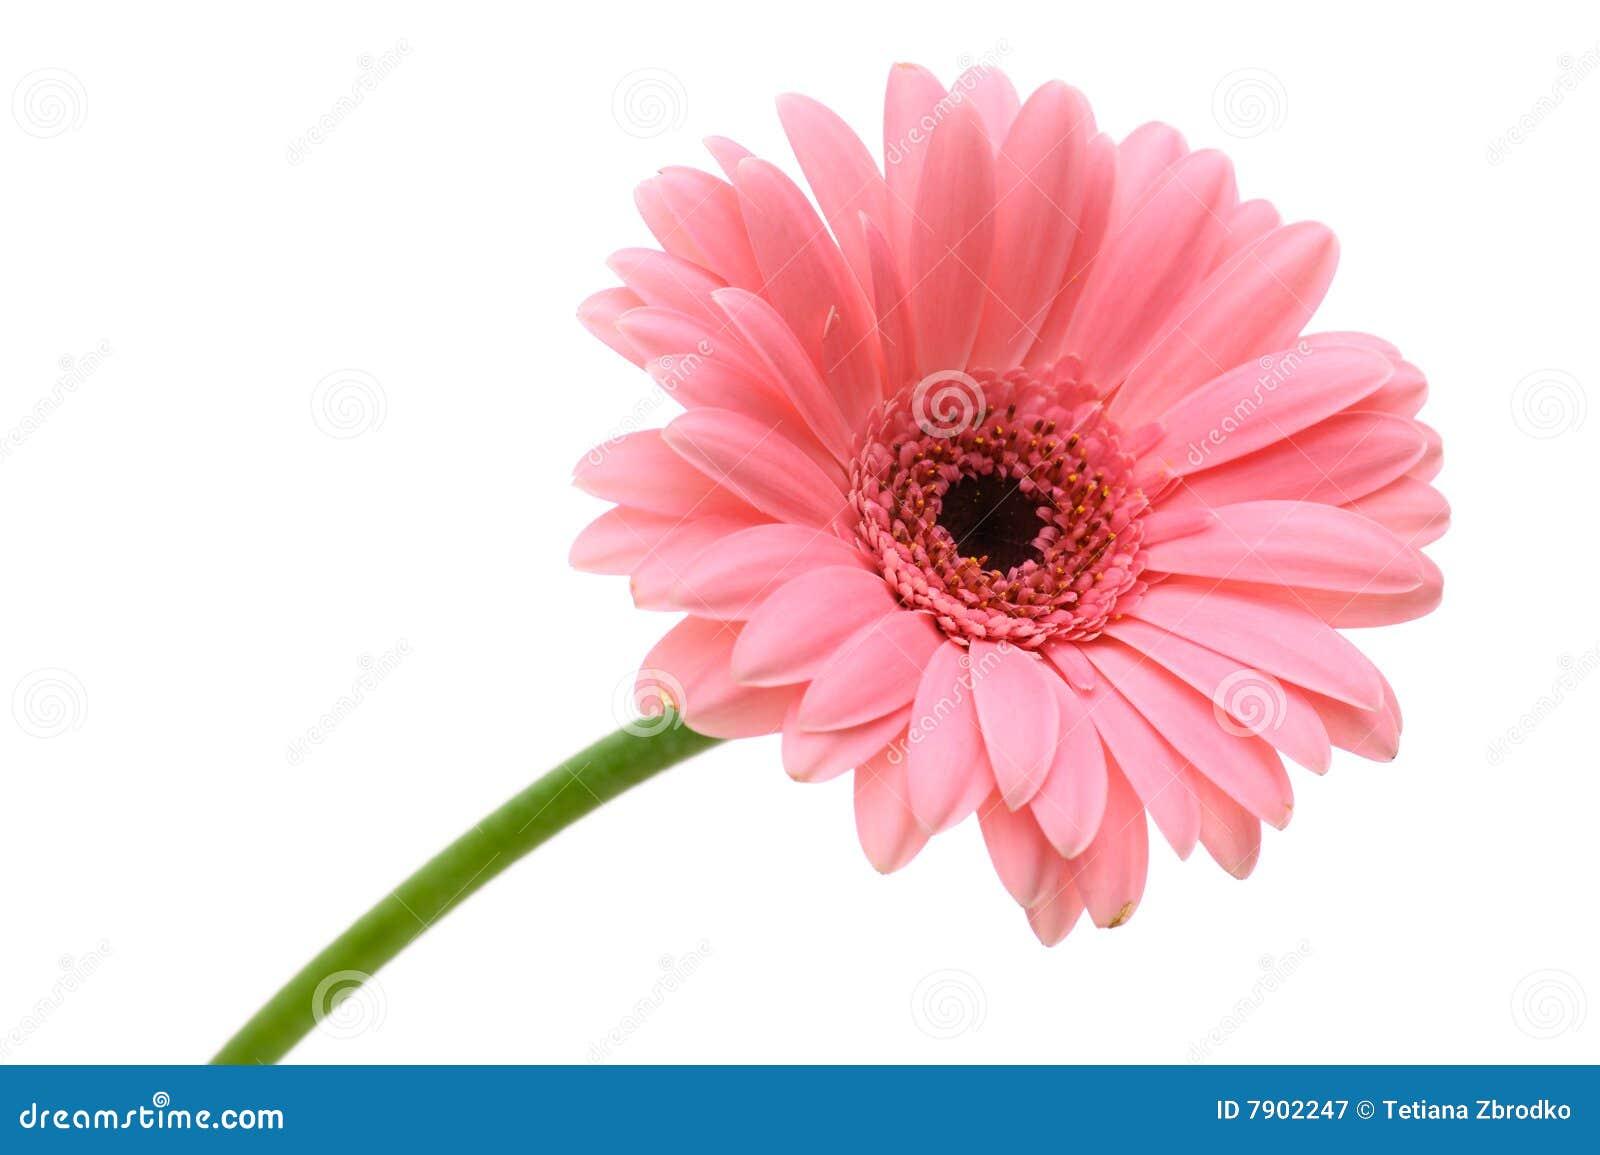 Flor vermelha da margarida